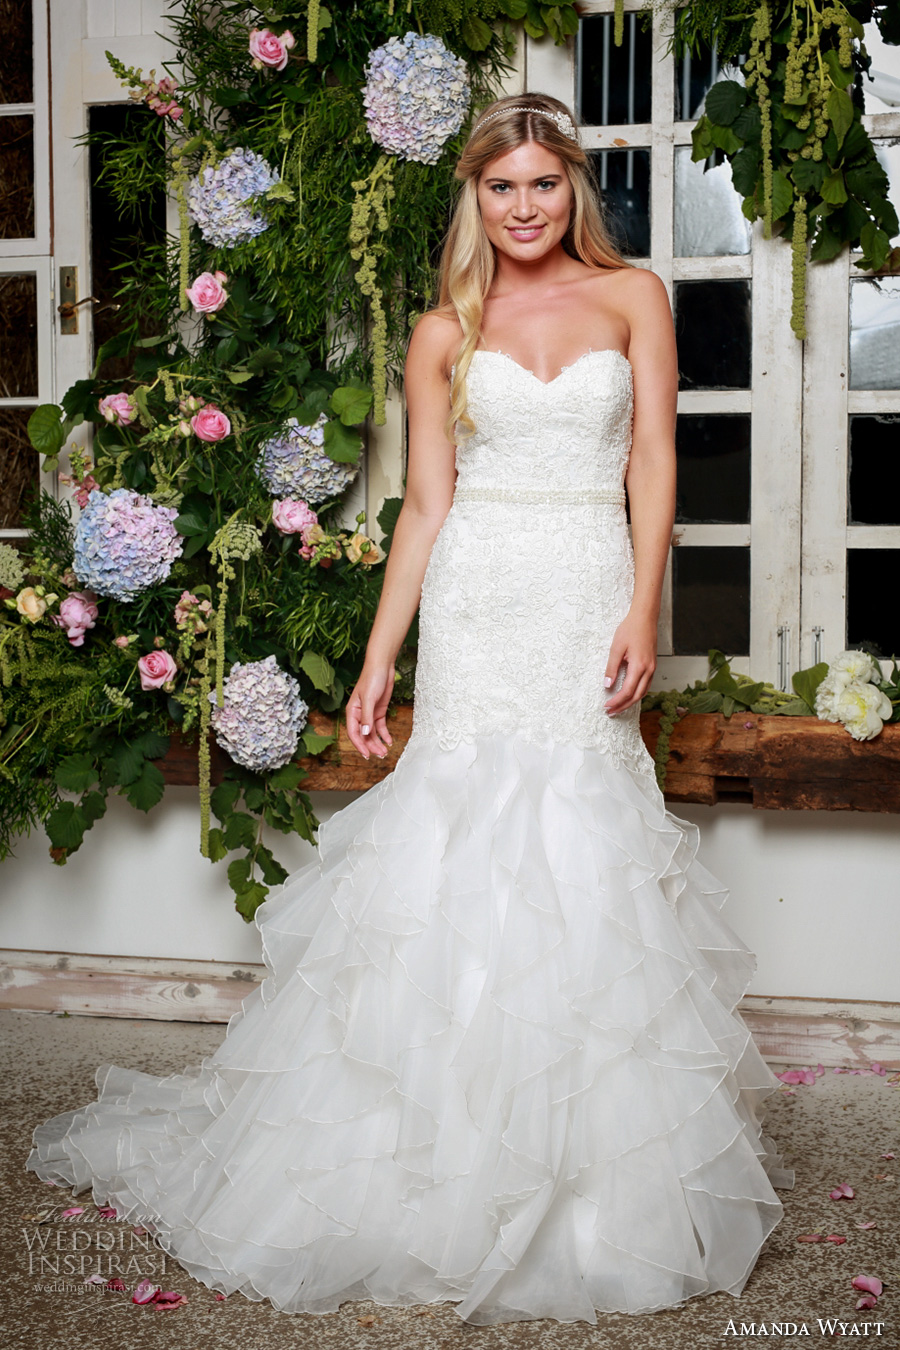 amanda wyatt 2017 bridal strapless sweetheart neckline heavily embellished bodice classic mermaid wedding dress chapel train (sabine) mv